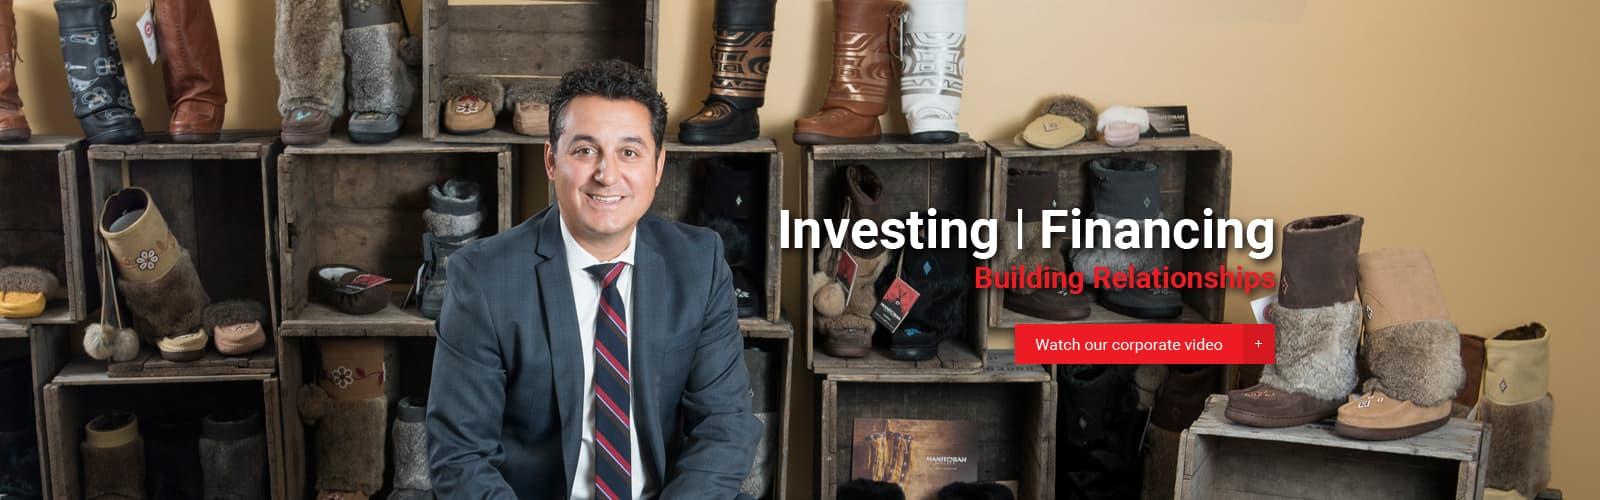 Investing, Financing, Building Relationships